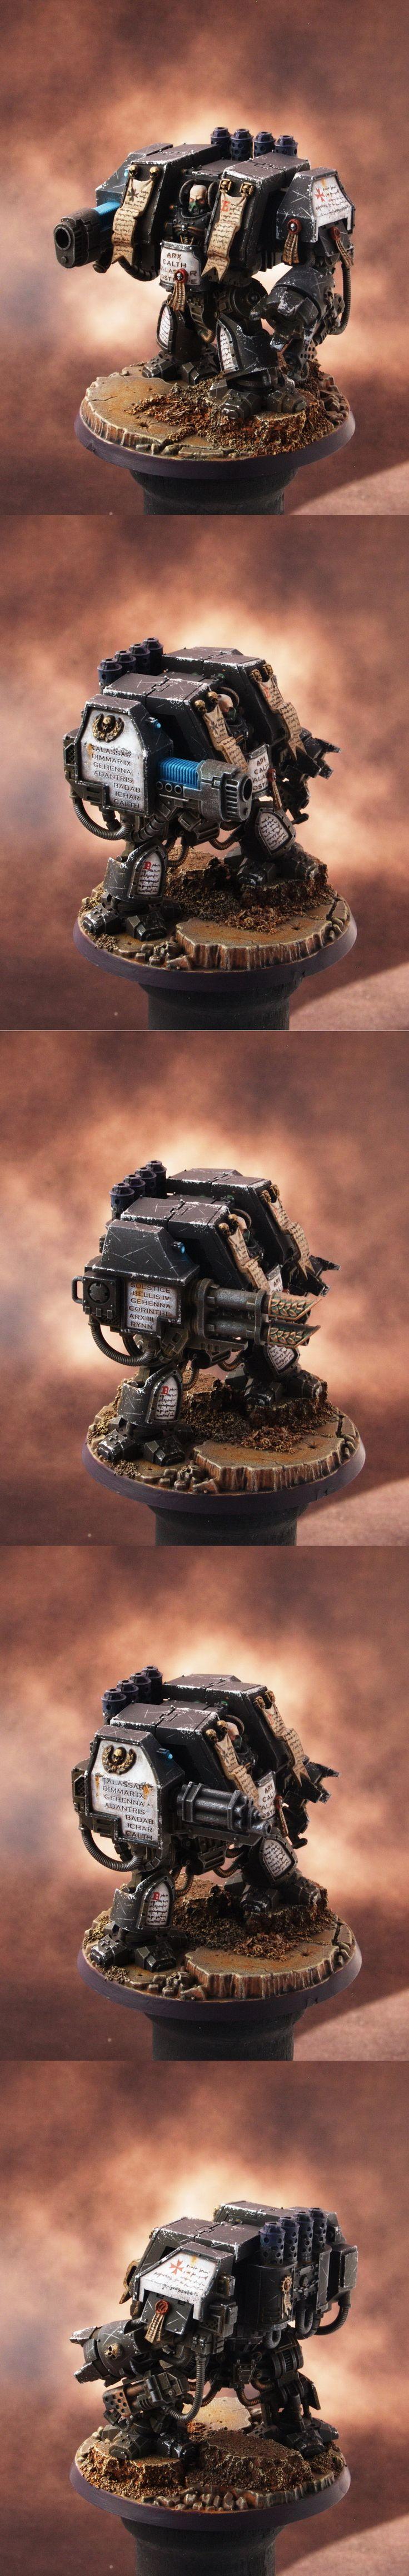 Black Templars Dreadnought